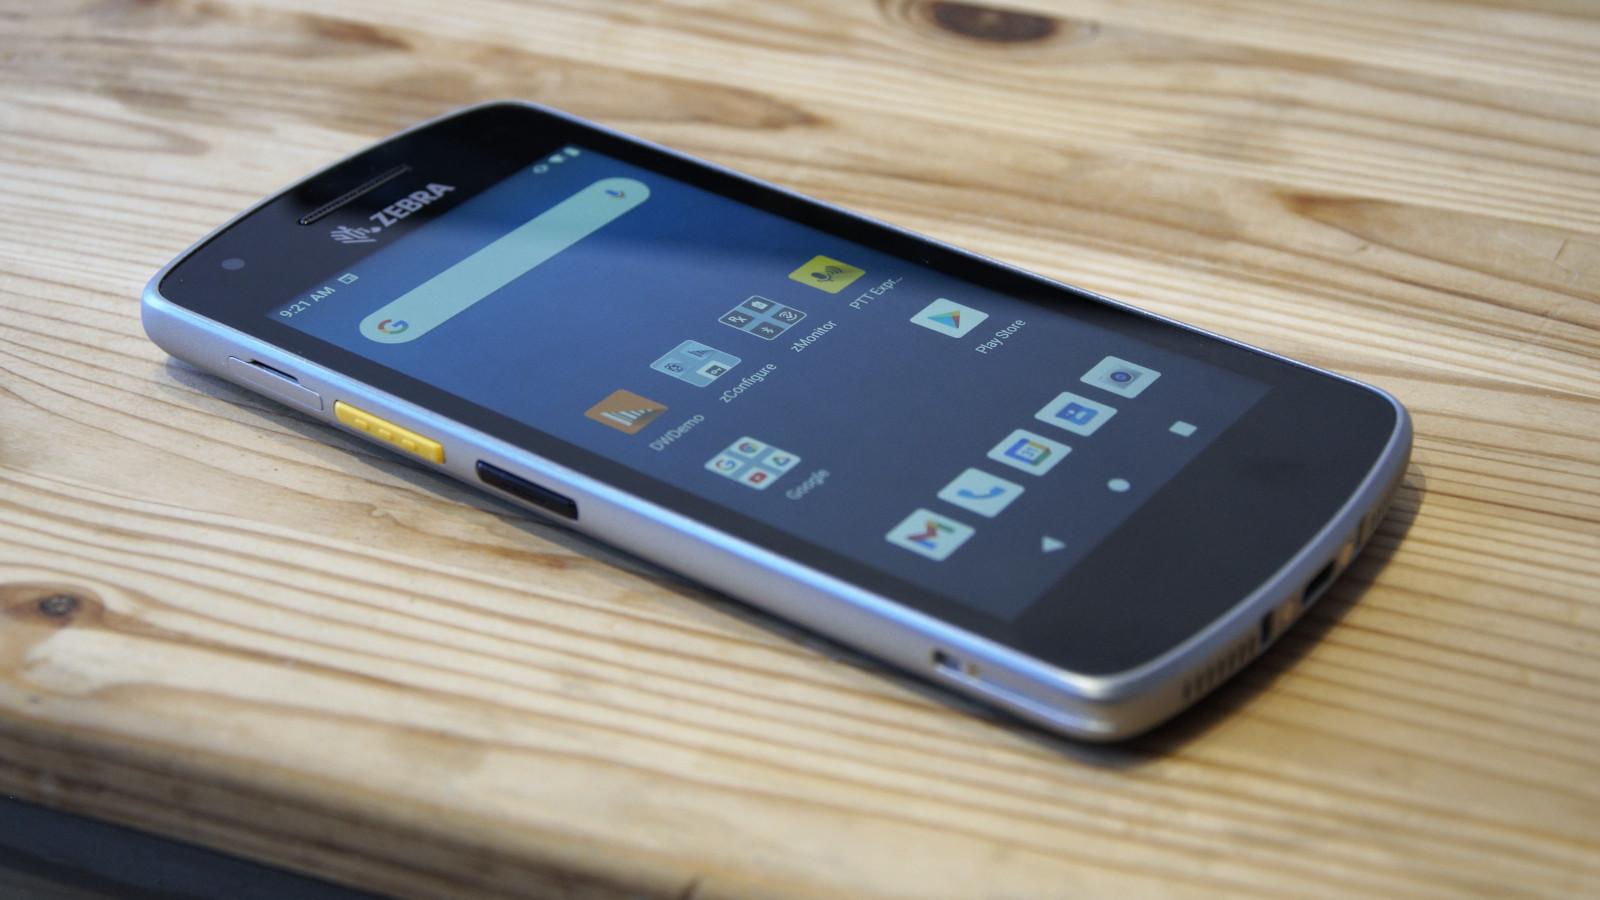 Zebra EC55 Mobile Computer